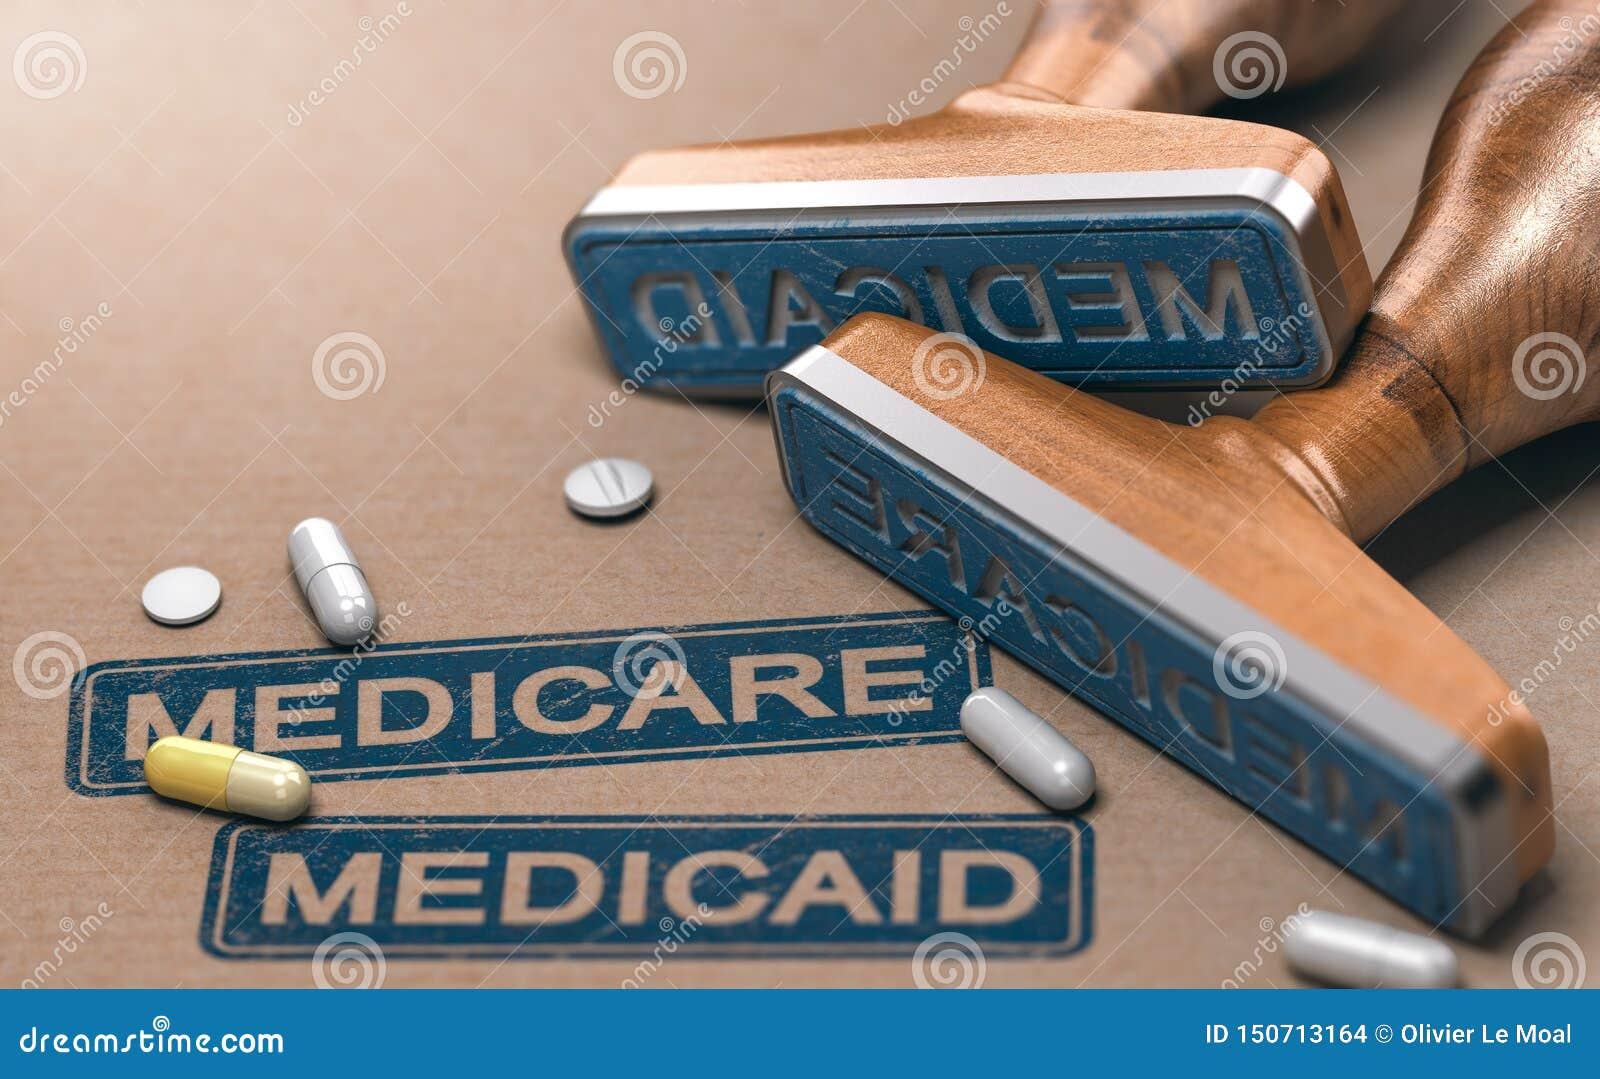 Medicare And Medicaid, National Health Insurance Program ...